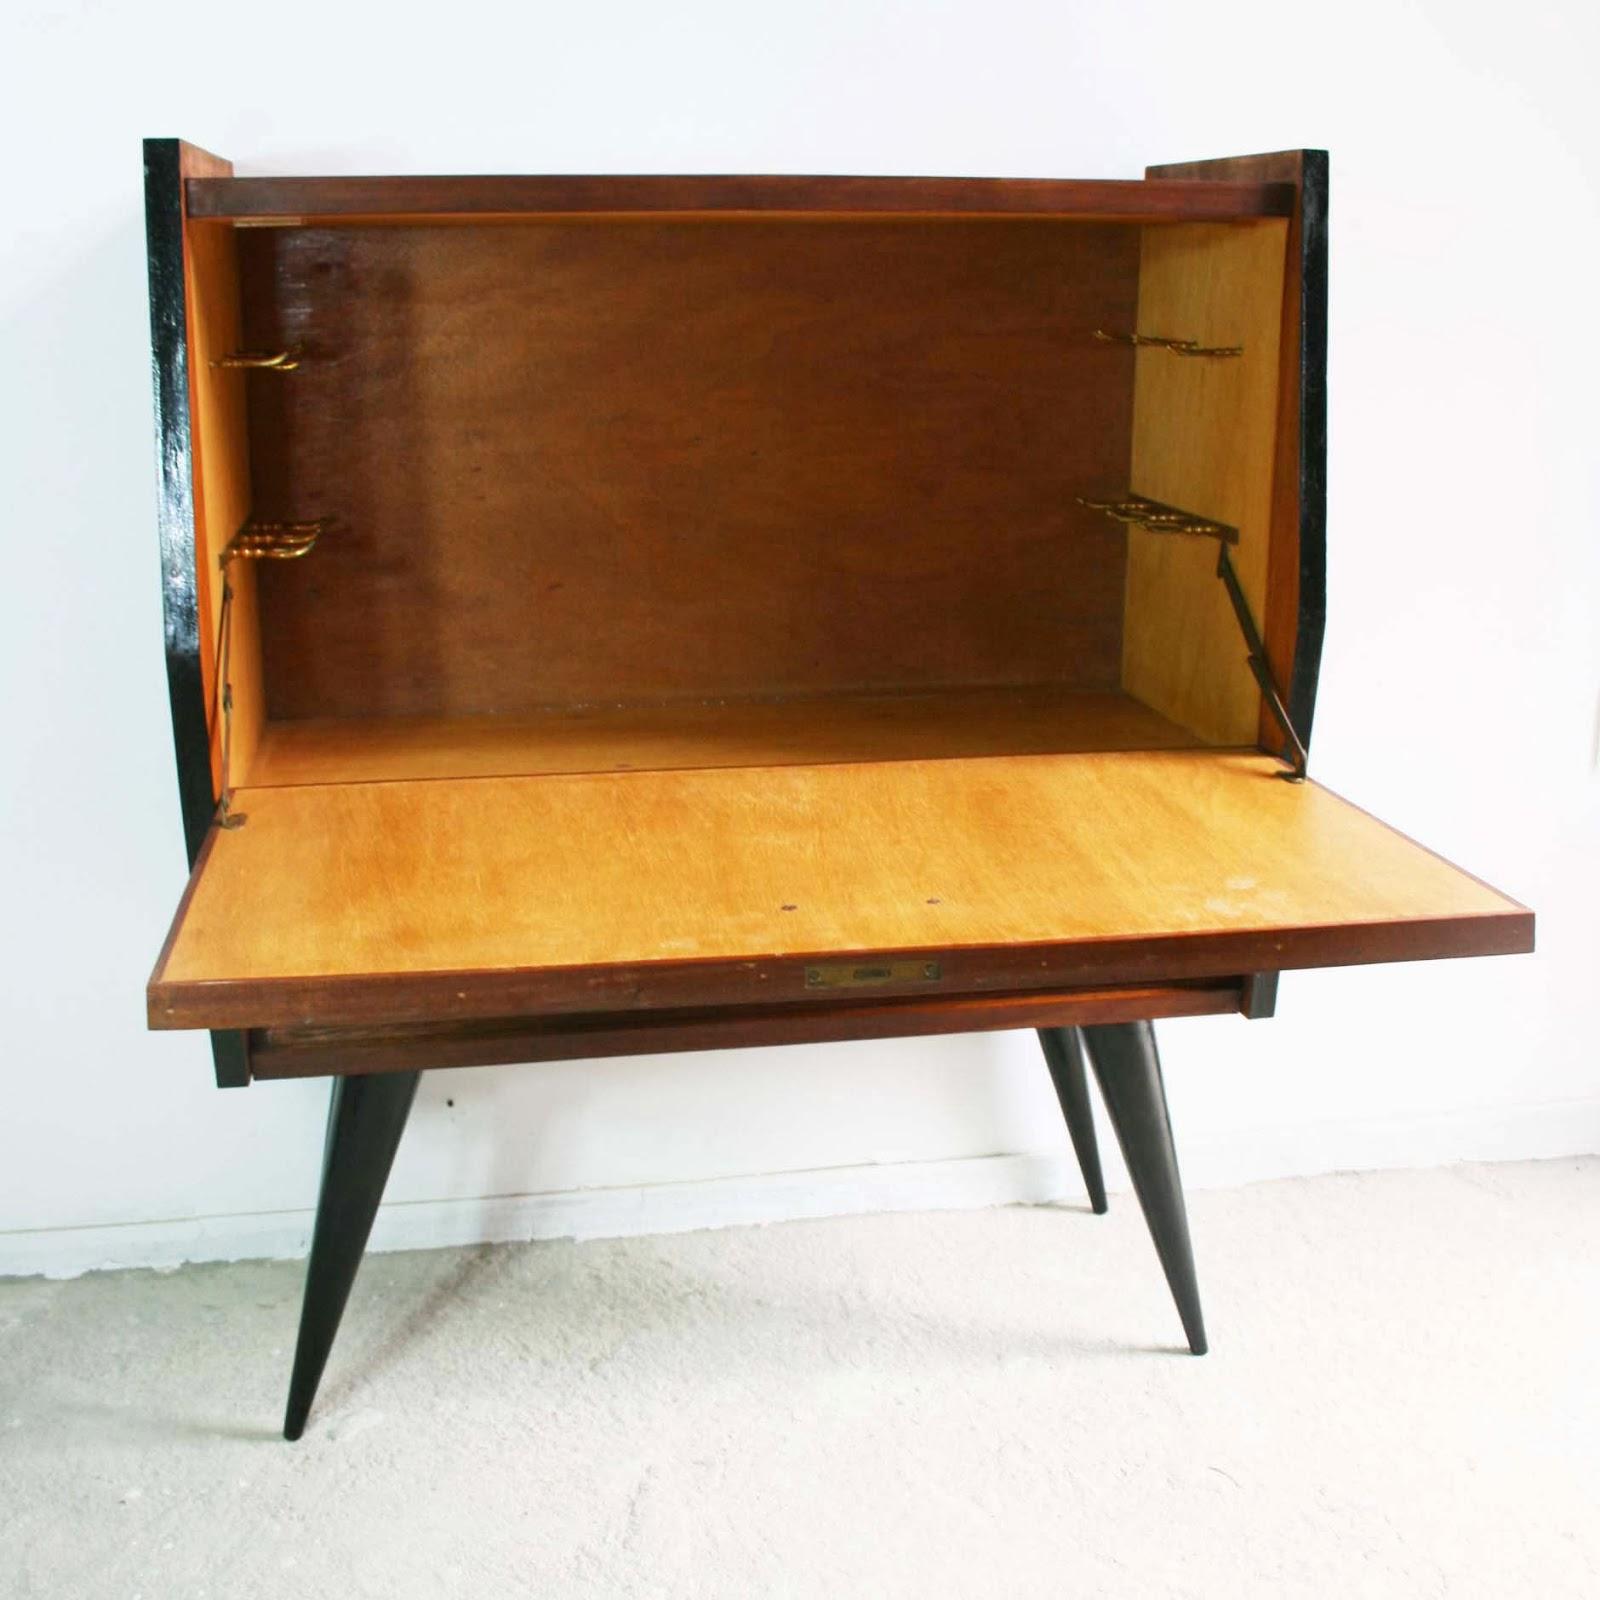 El rastronauta mueble bar a os 60 - Muebles anos 60 ...